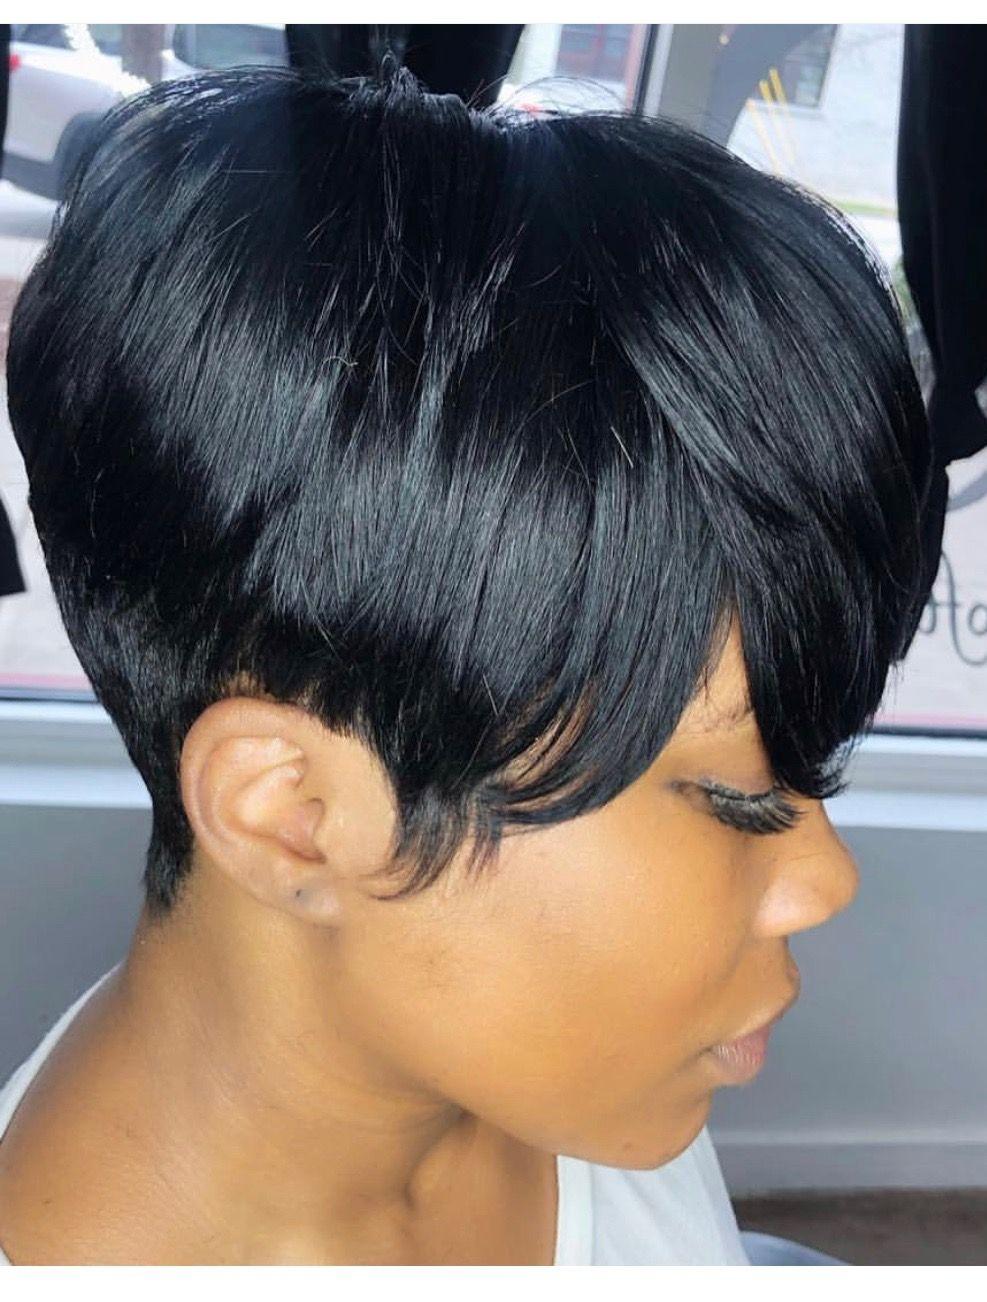 Pin By Janet Bullard On Janet Short Natural Curly Hair Short